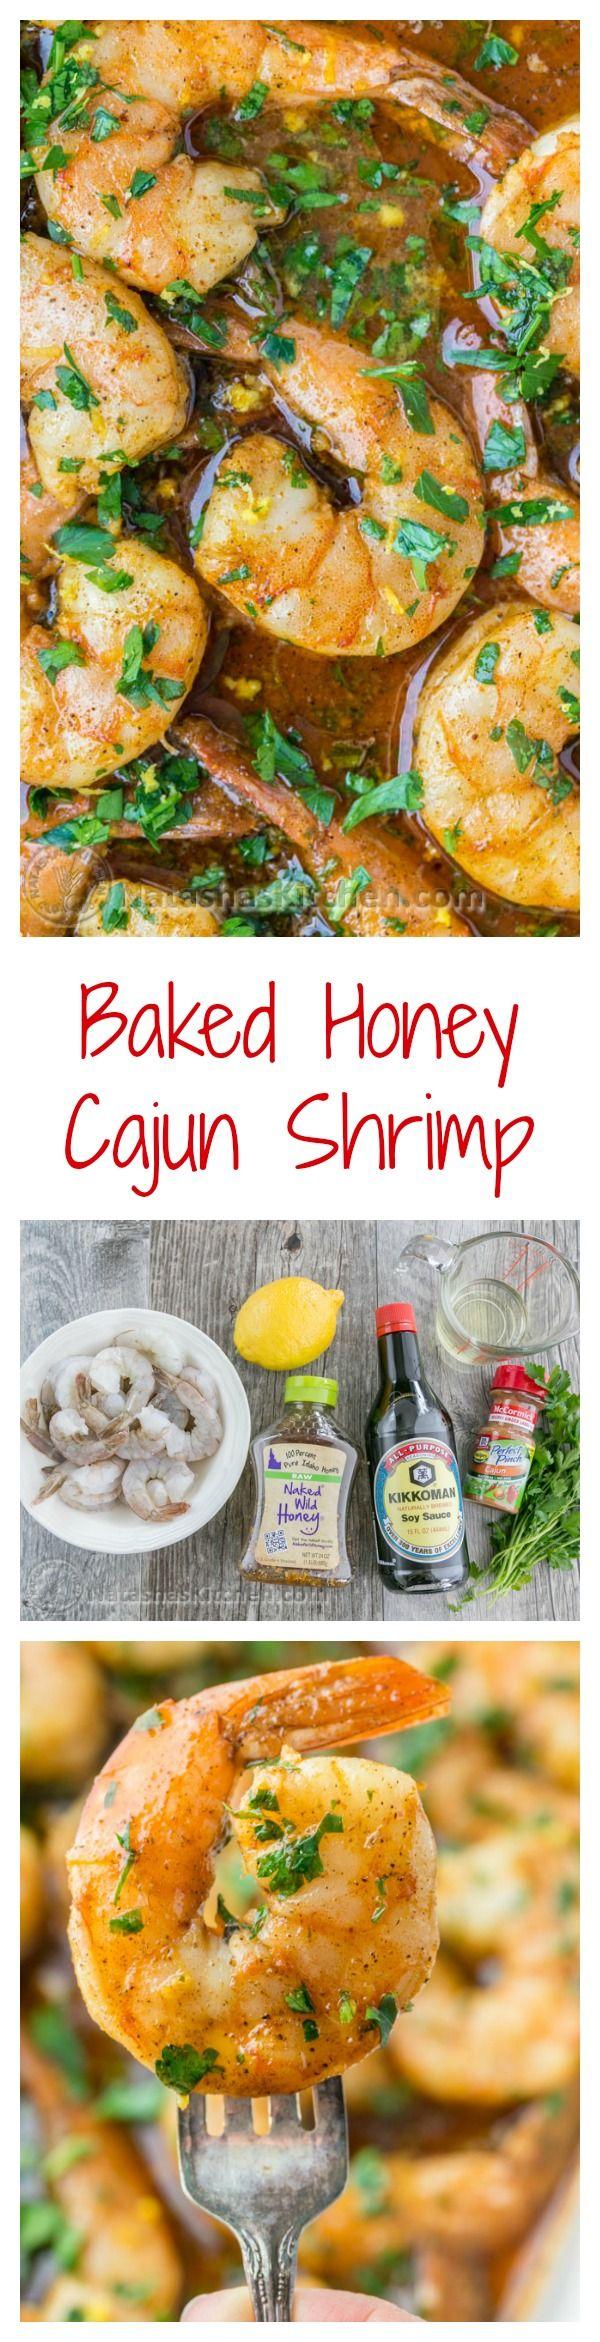 Baked Honey Cajun Shrimp. Easy & SO addictive! Great over potatoes, rice or pasta. @natashaskitchen